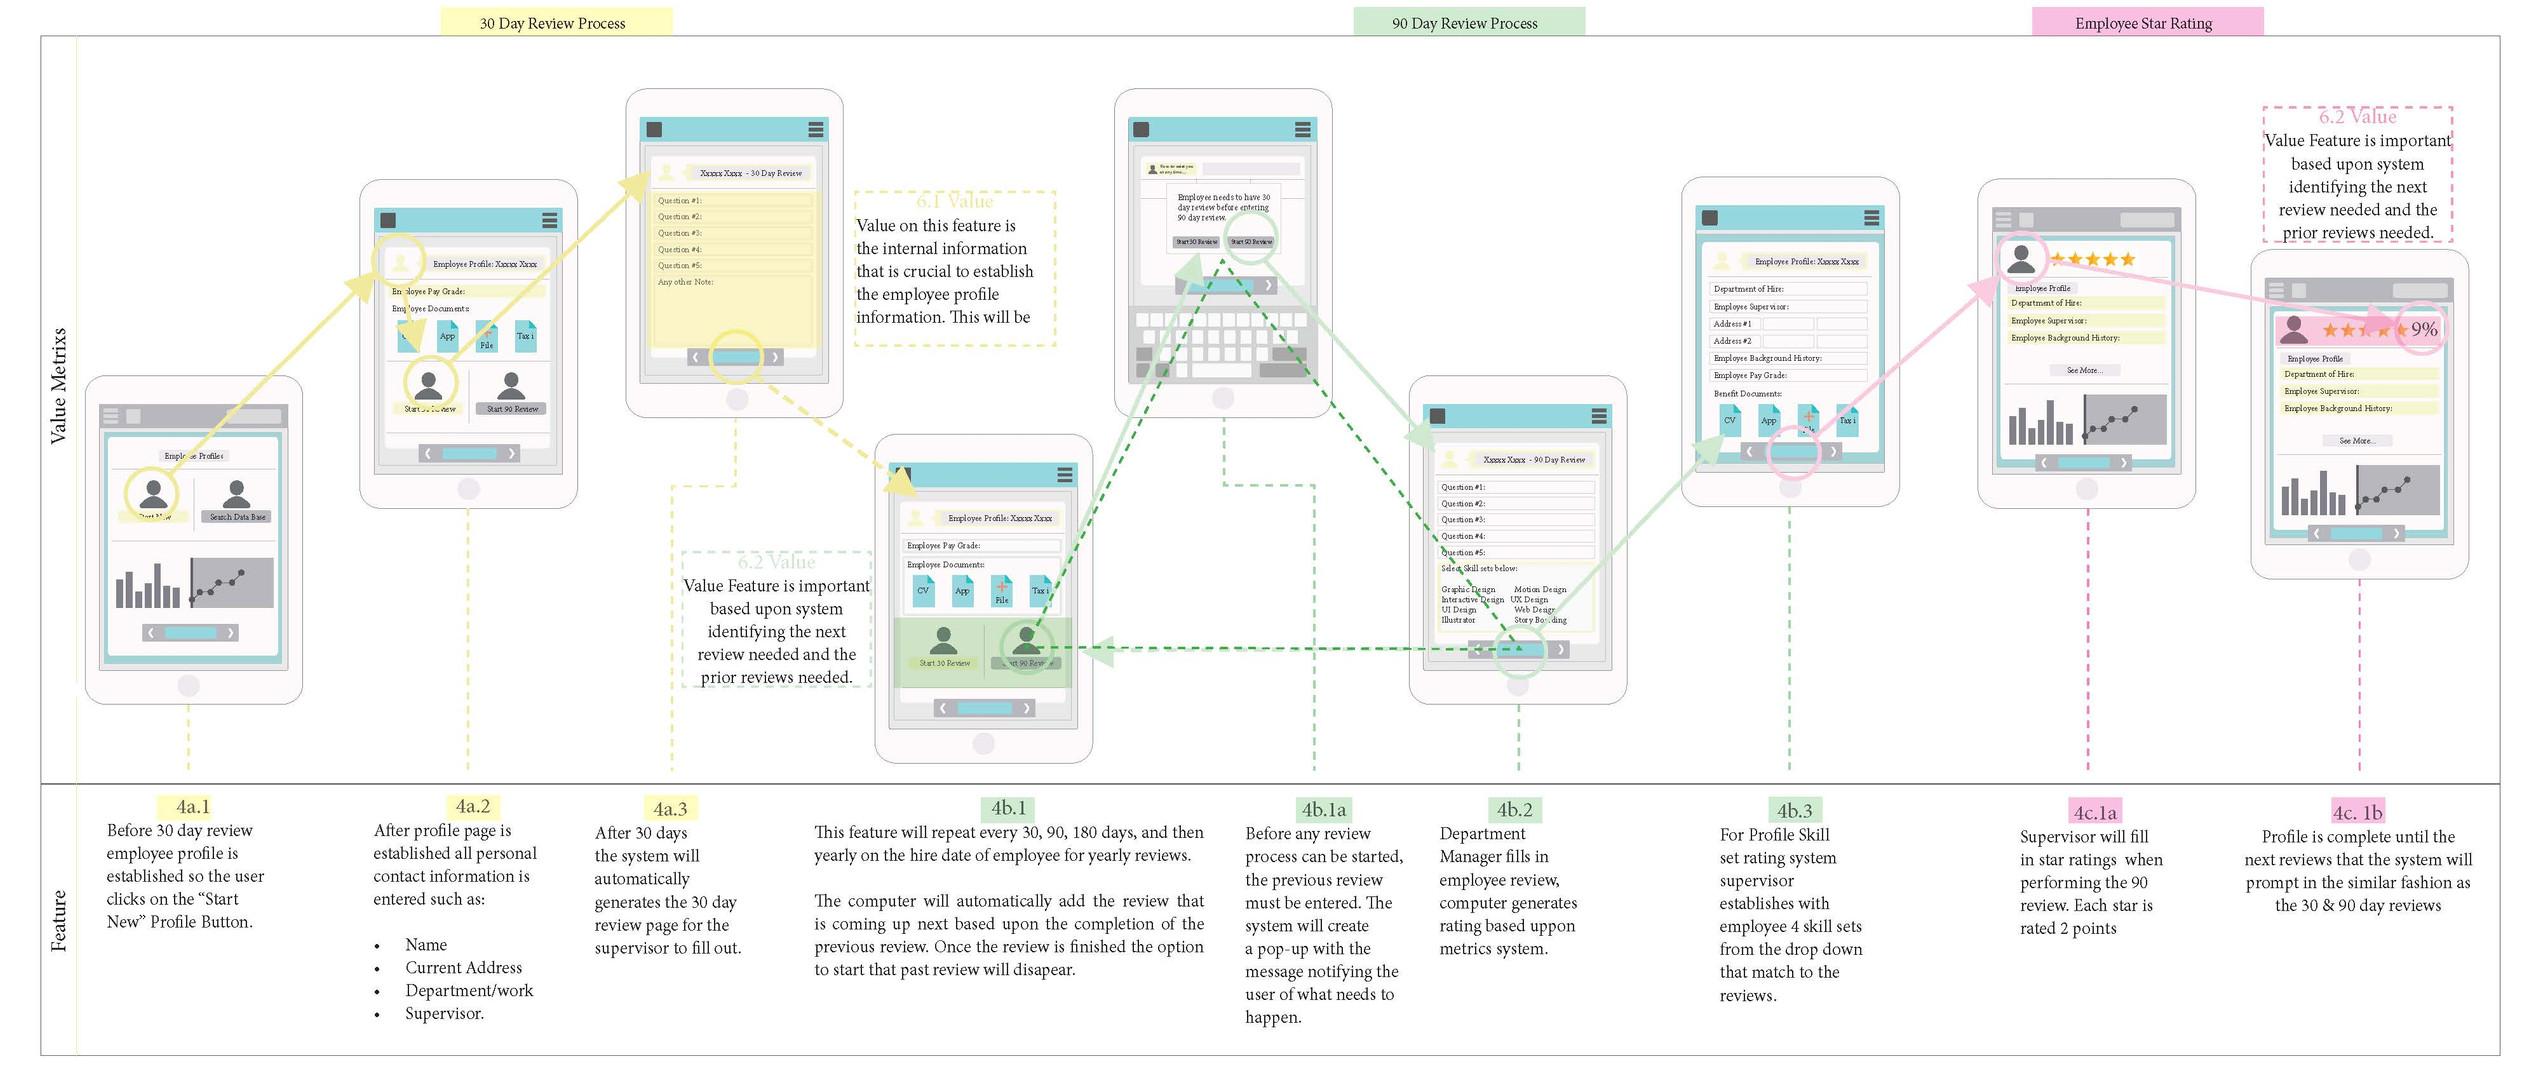 HR Strategy Annotation.jpg